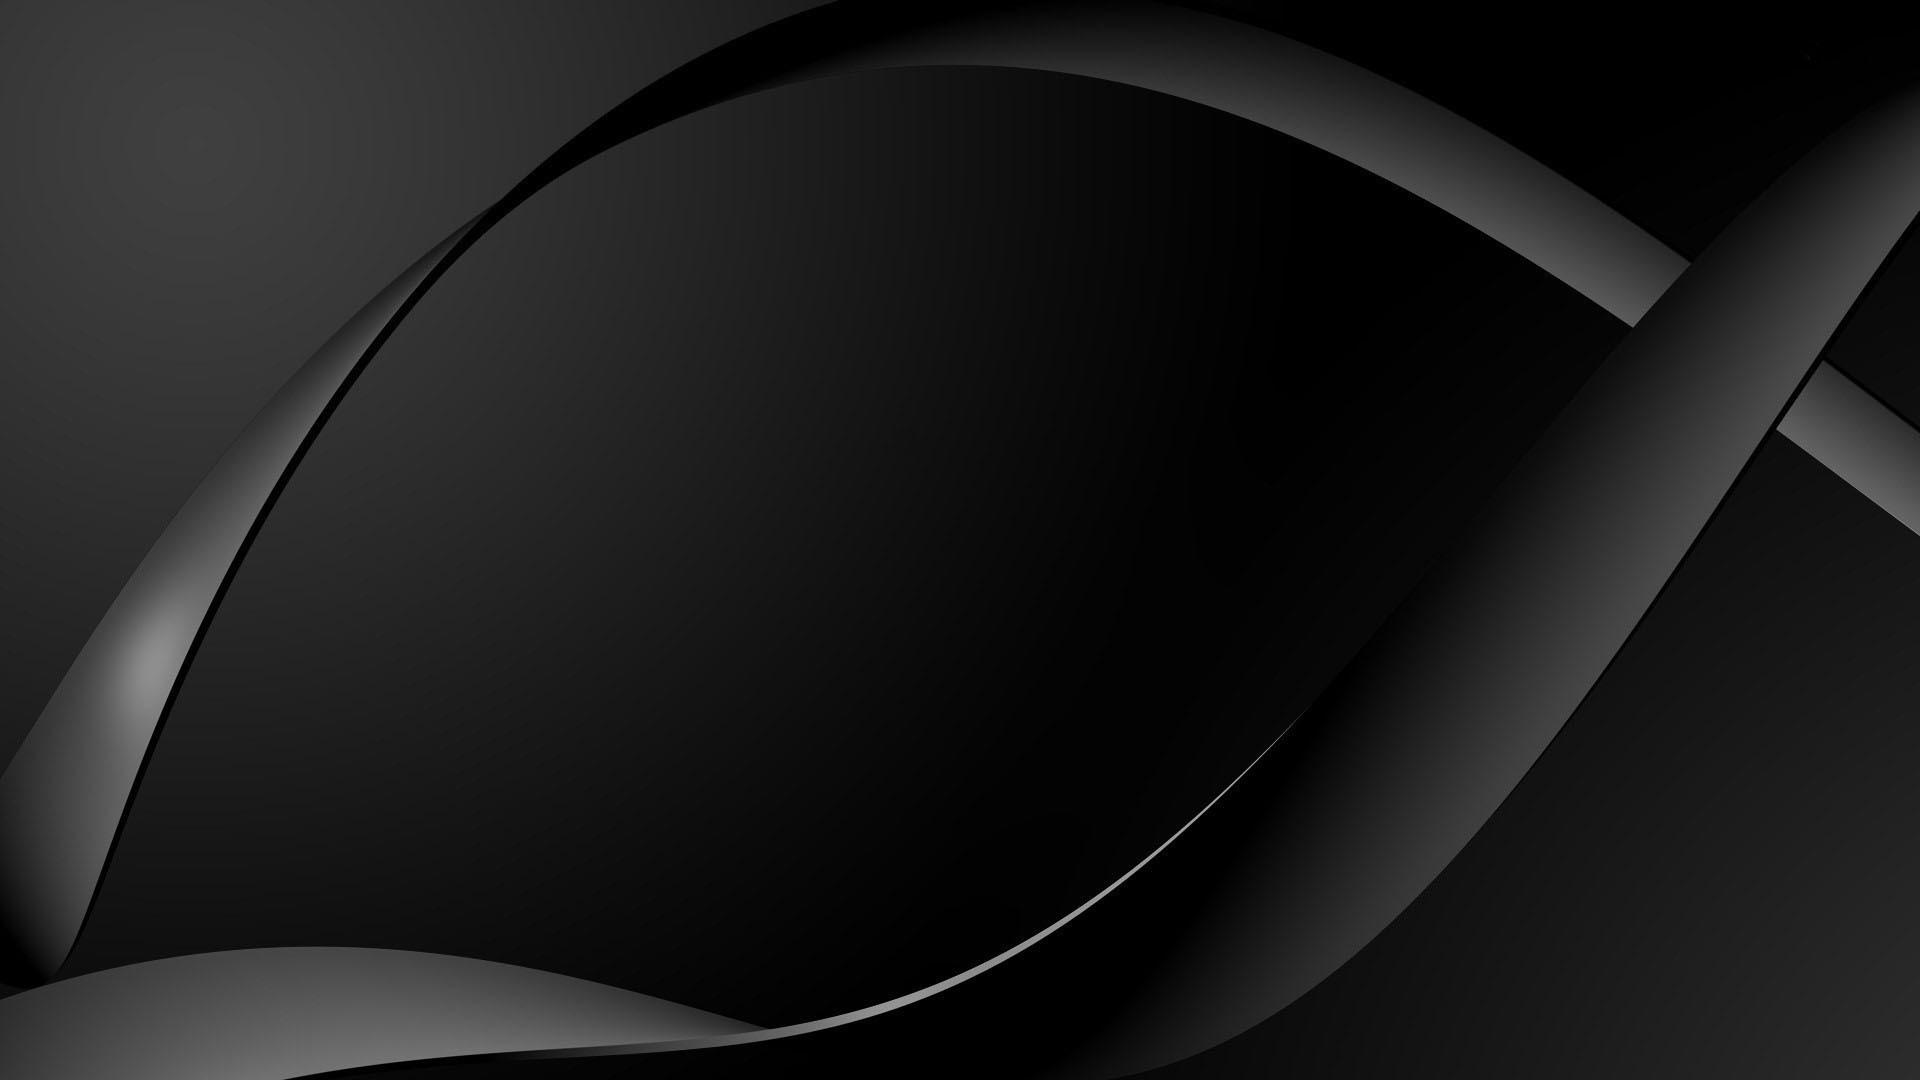 Black Abstract Widescreen